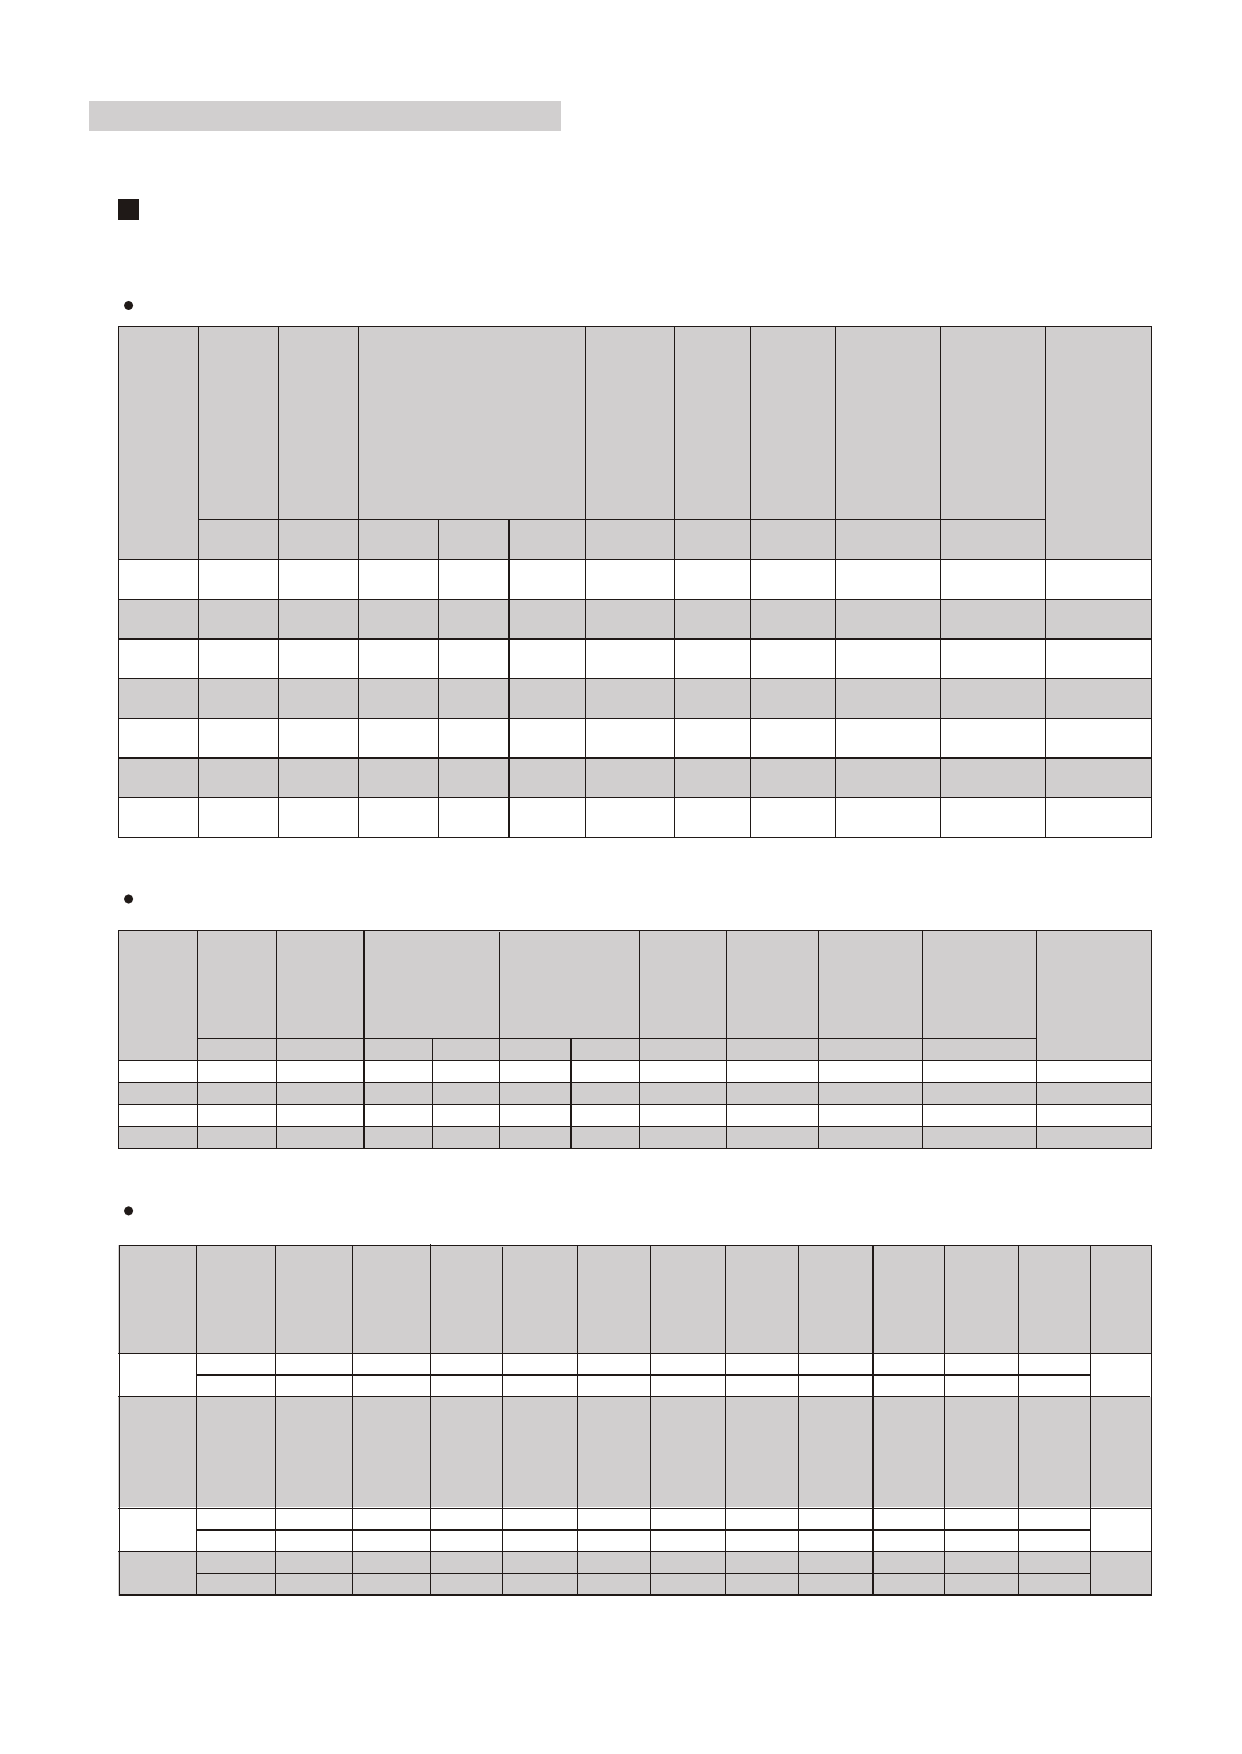 LBN4502 datasheet